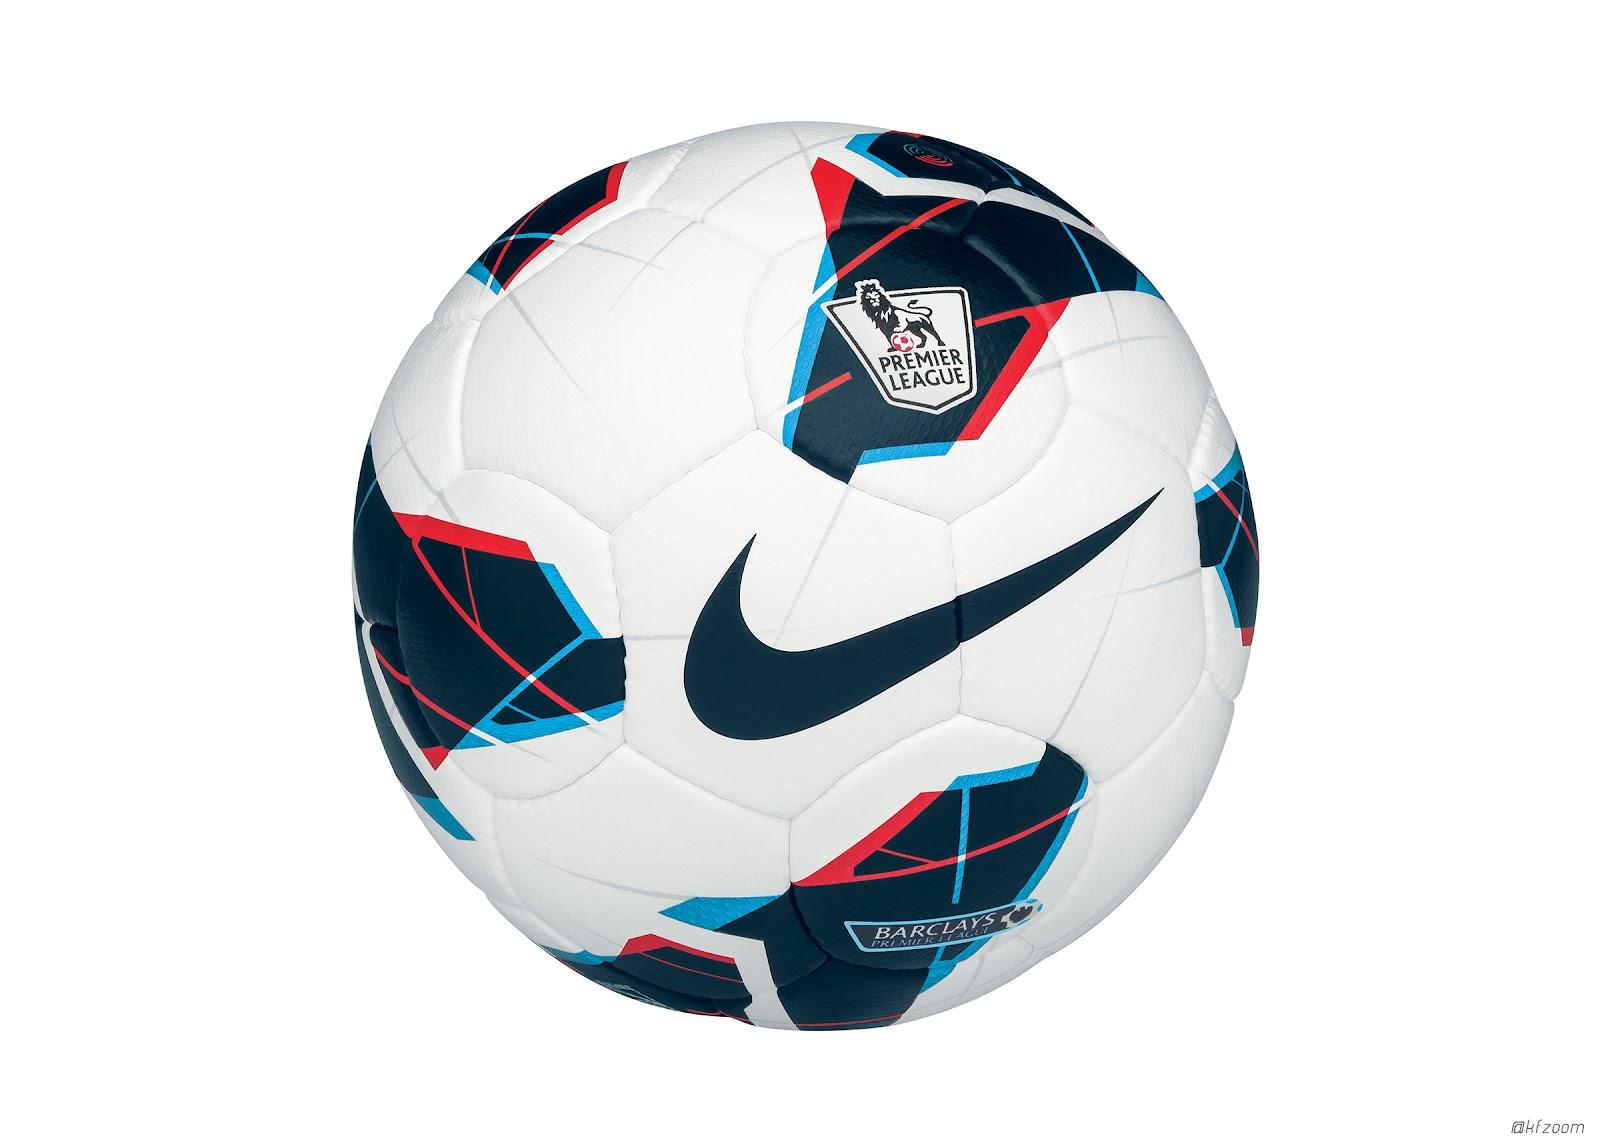 2012 2013 premier league official match ball 2012 2013 serie